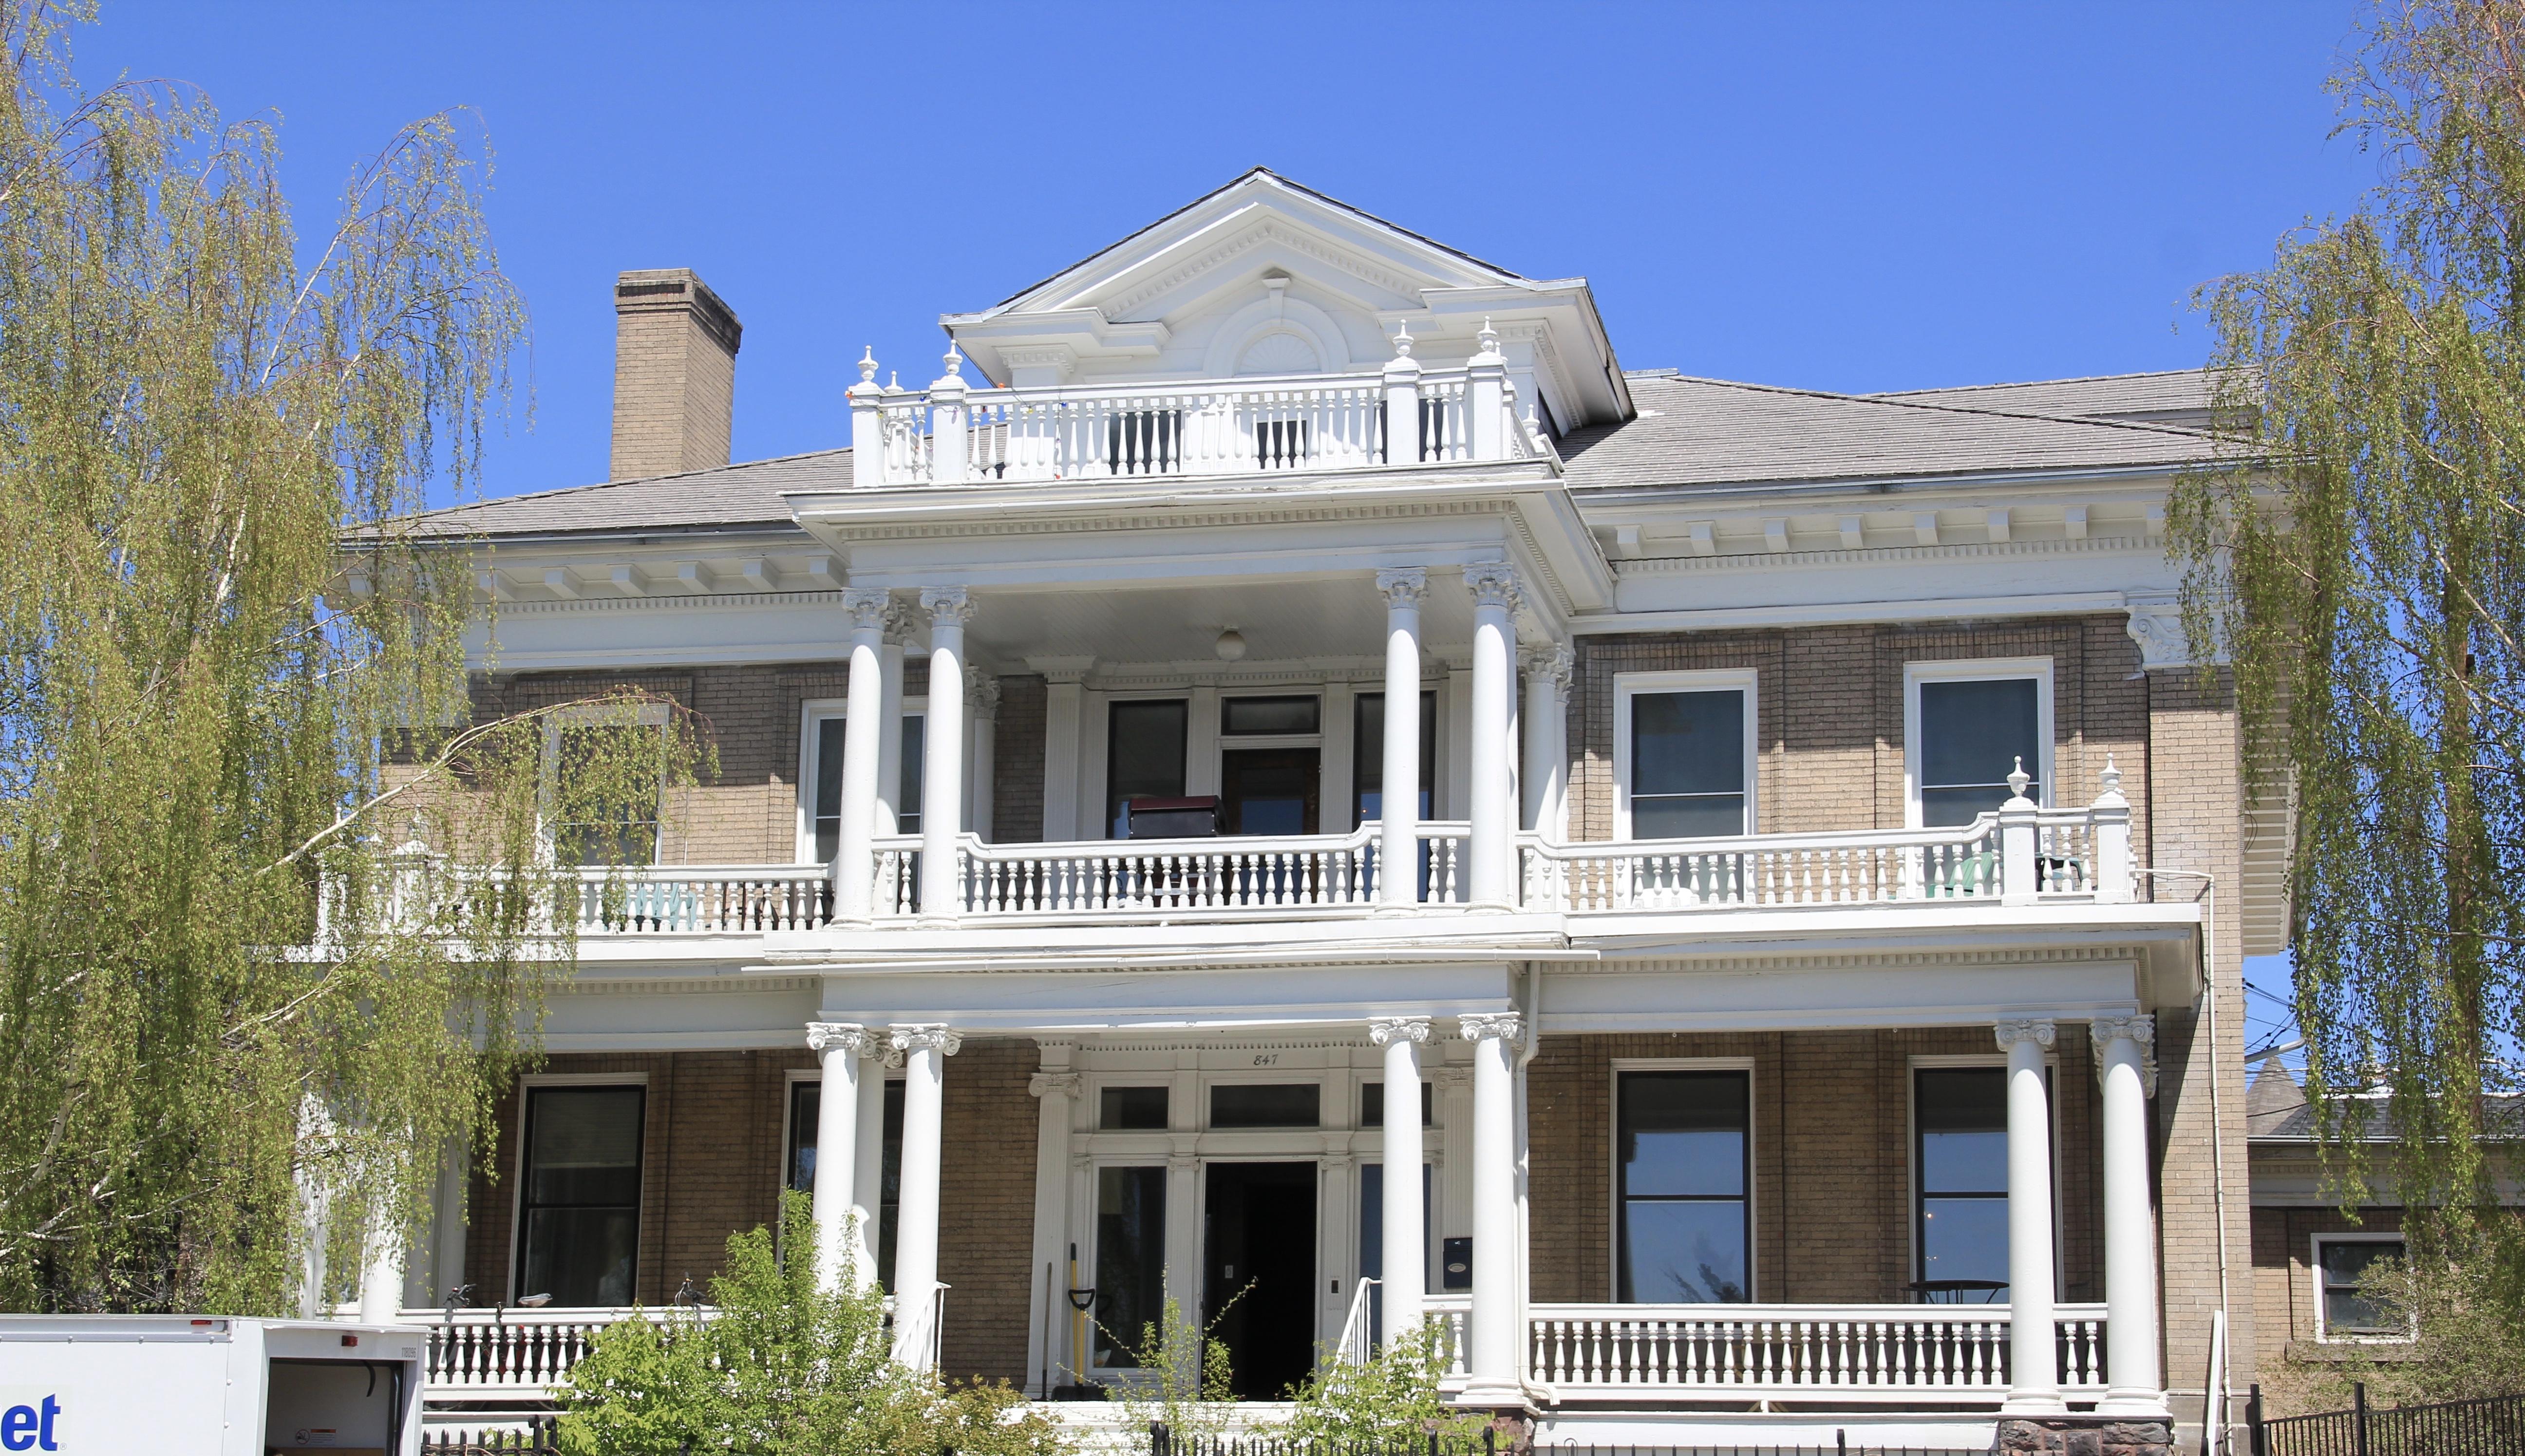 847 Park, Hennessey Mansion, c. 1900, Butte